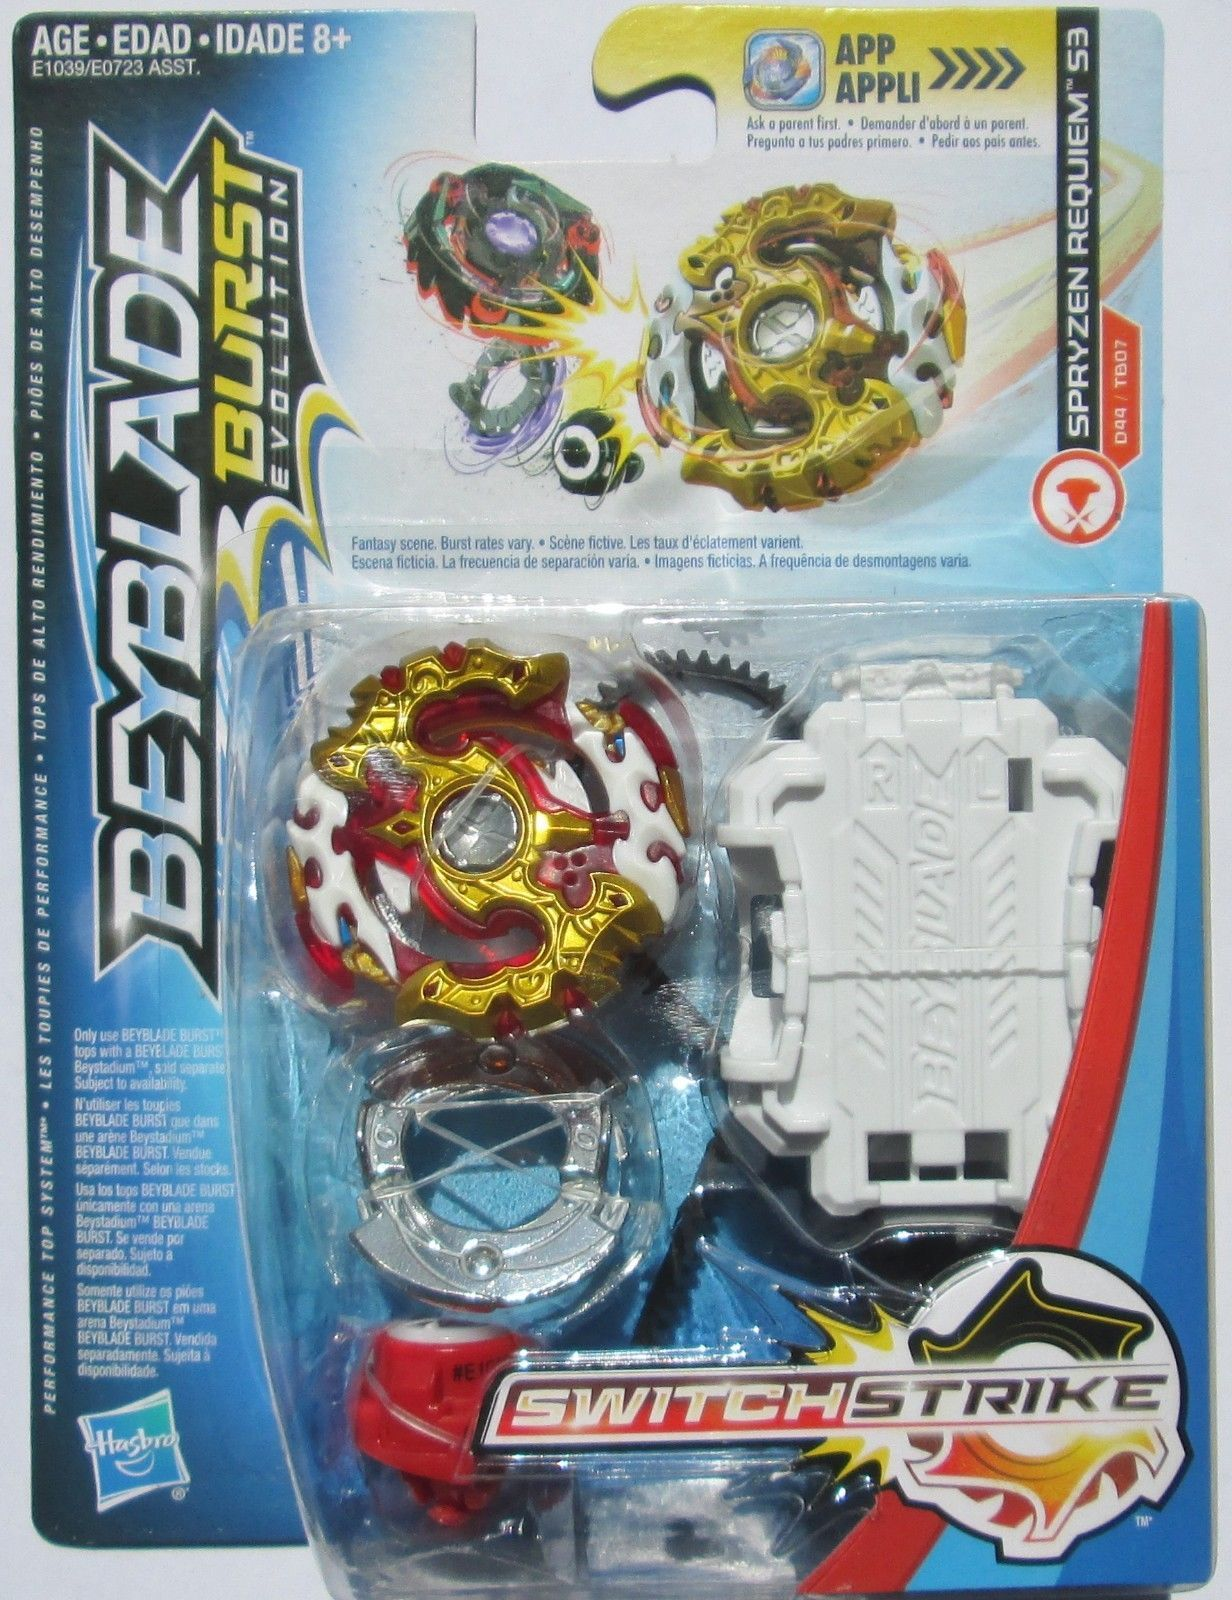 20 99 Beyblade Burst Evolution Switch Strike Spryzen Requiem S3 Hasbro Us Seller Beyblade Burst Evo Beyblade Toys Beyblade Burst Kids Toy Gifts